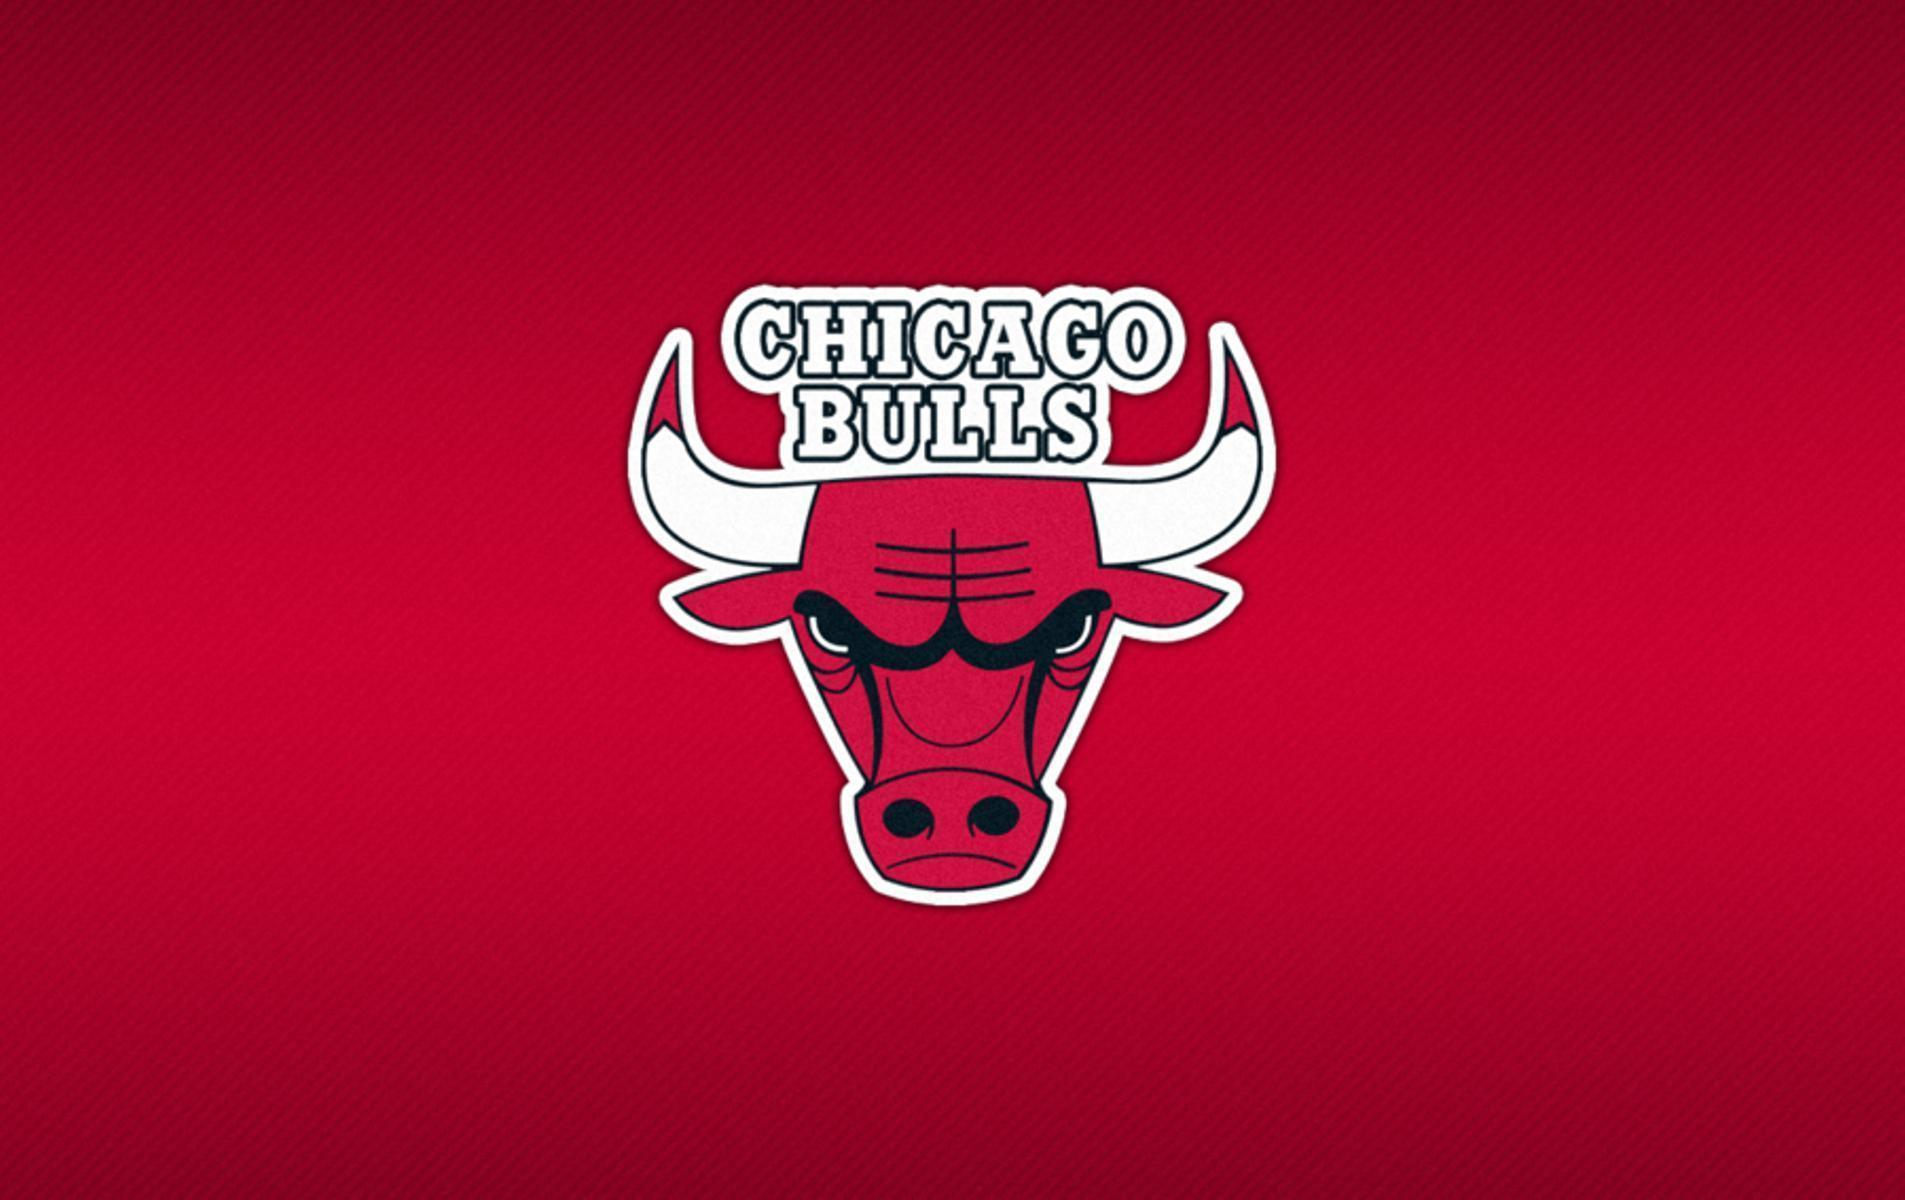 Chicago Bulls Wallpaper HD Sport Wallpapers HD - Wallpapers HD